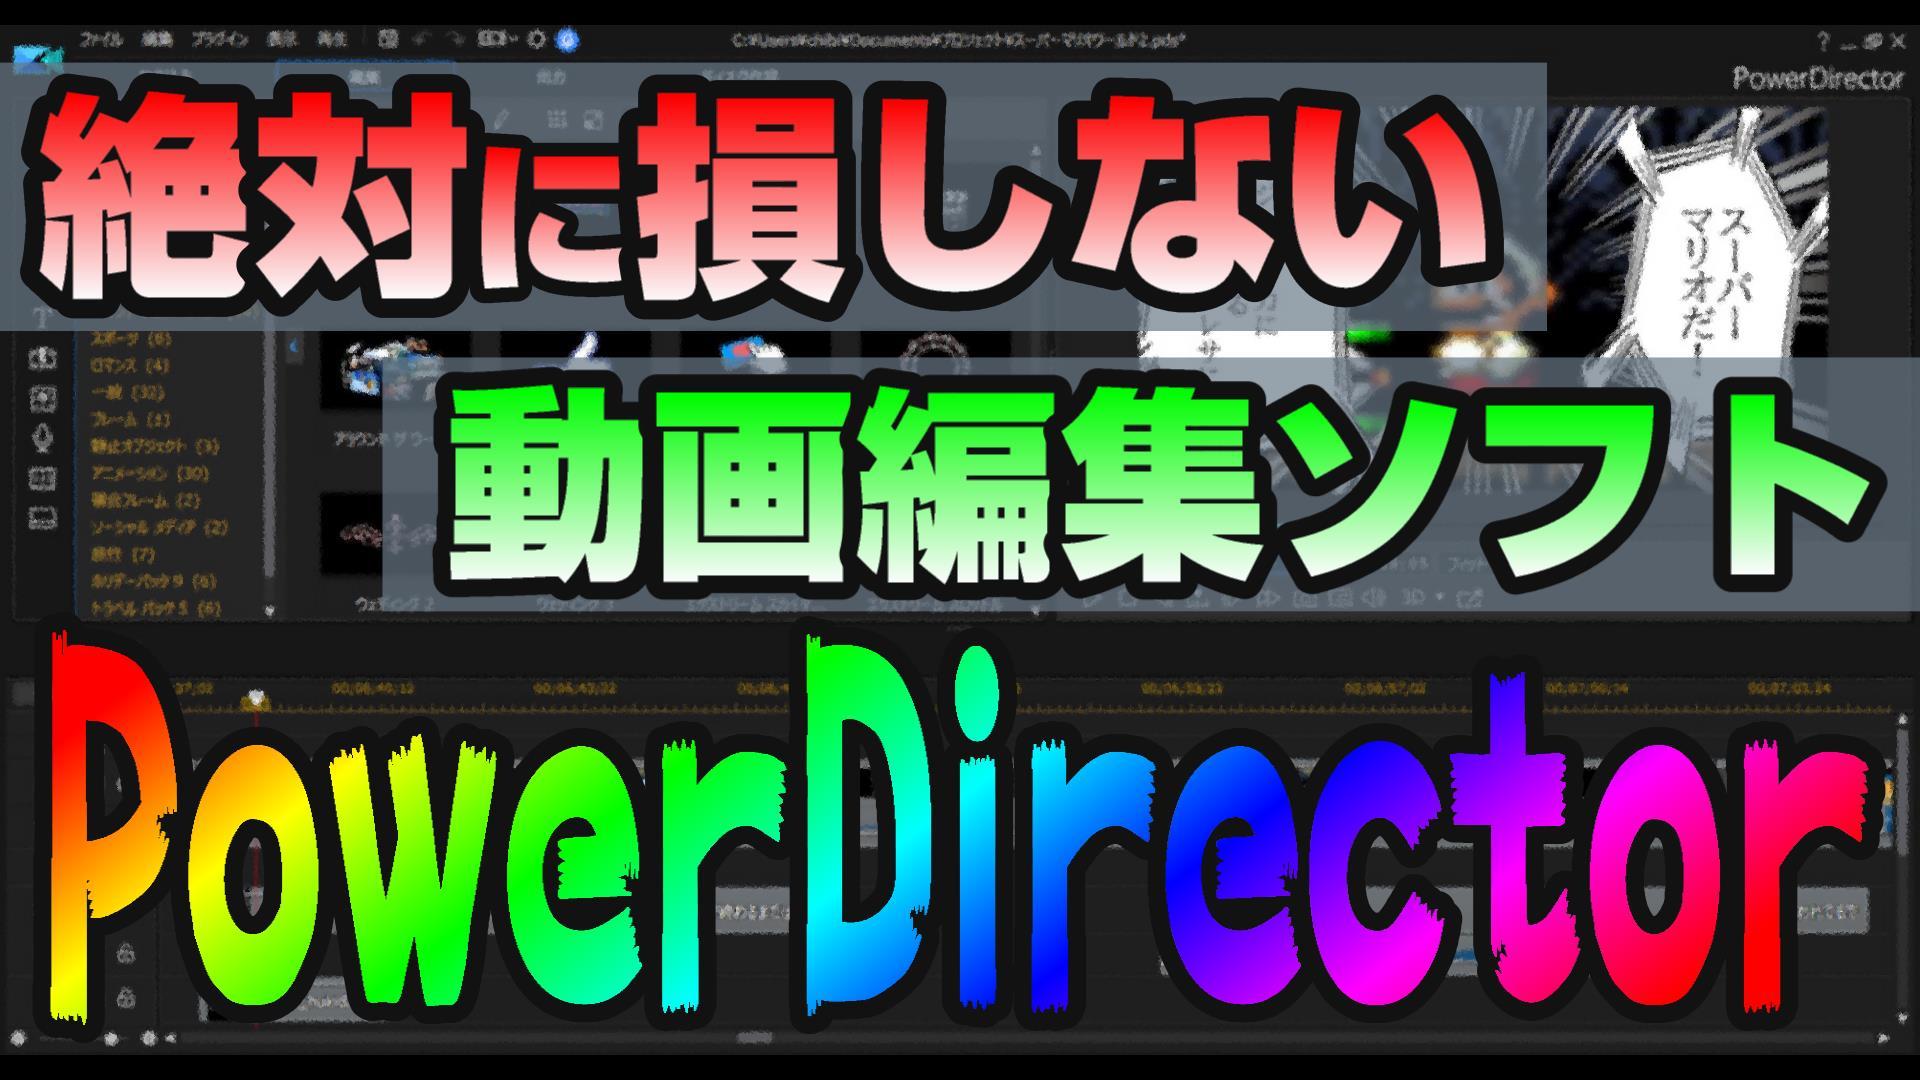 PowerDirectorで作ったアイキャッチ